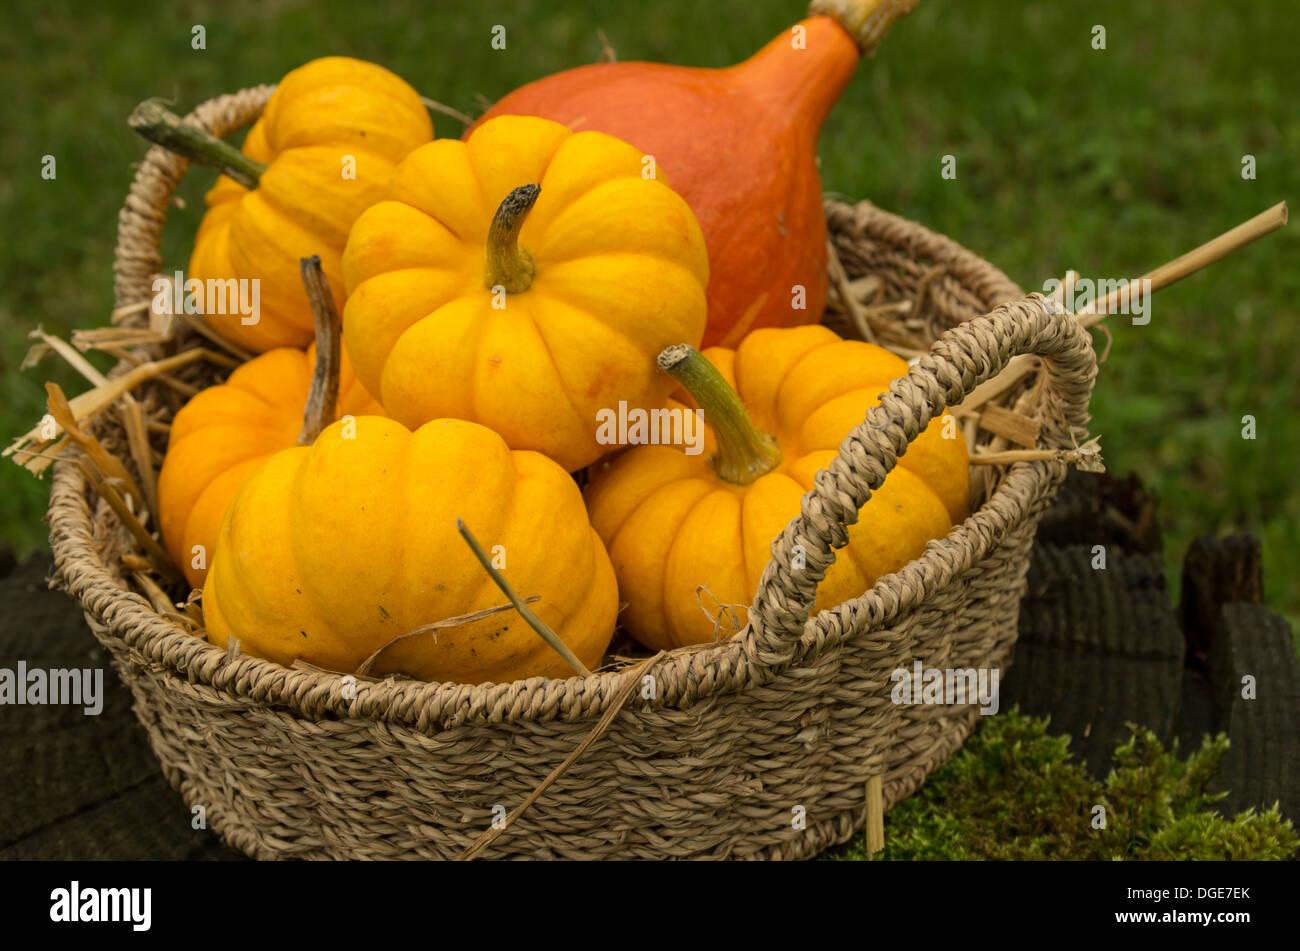 Munchkin pumpkins and a red kuri squash in a wicker basket. - Stock Image